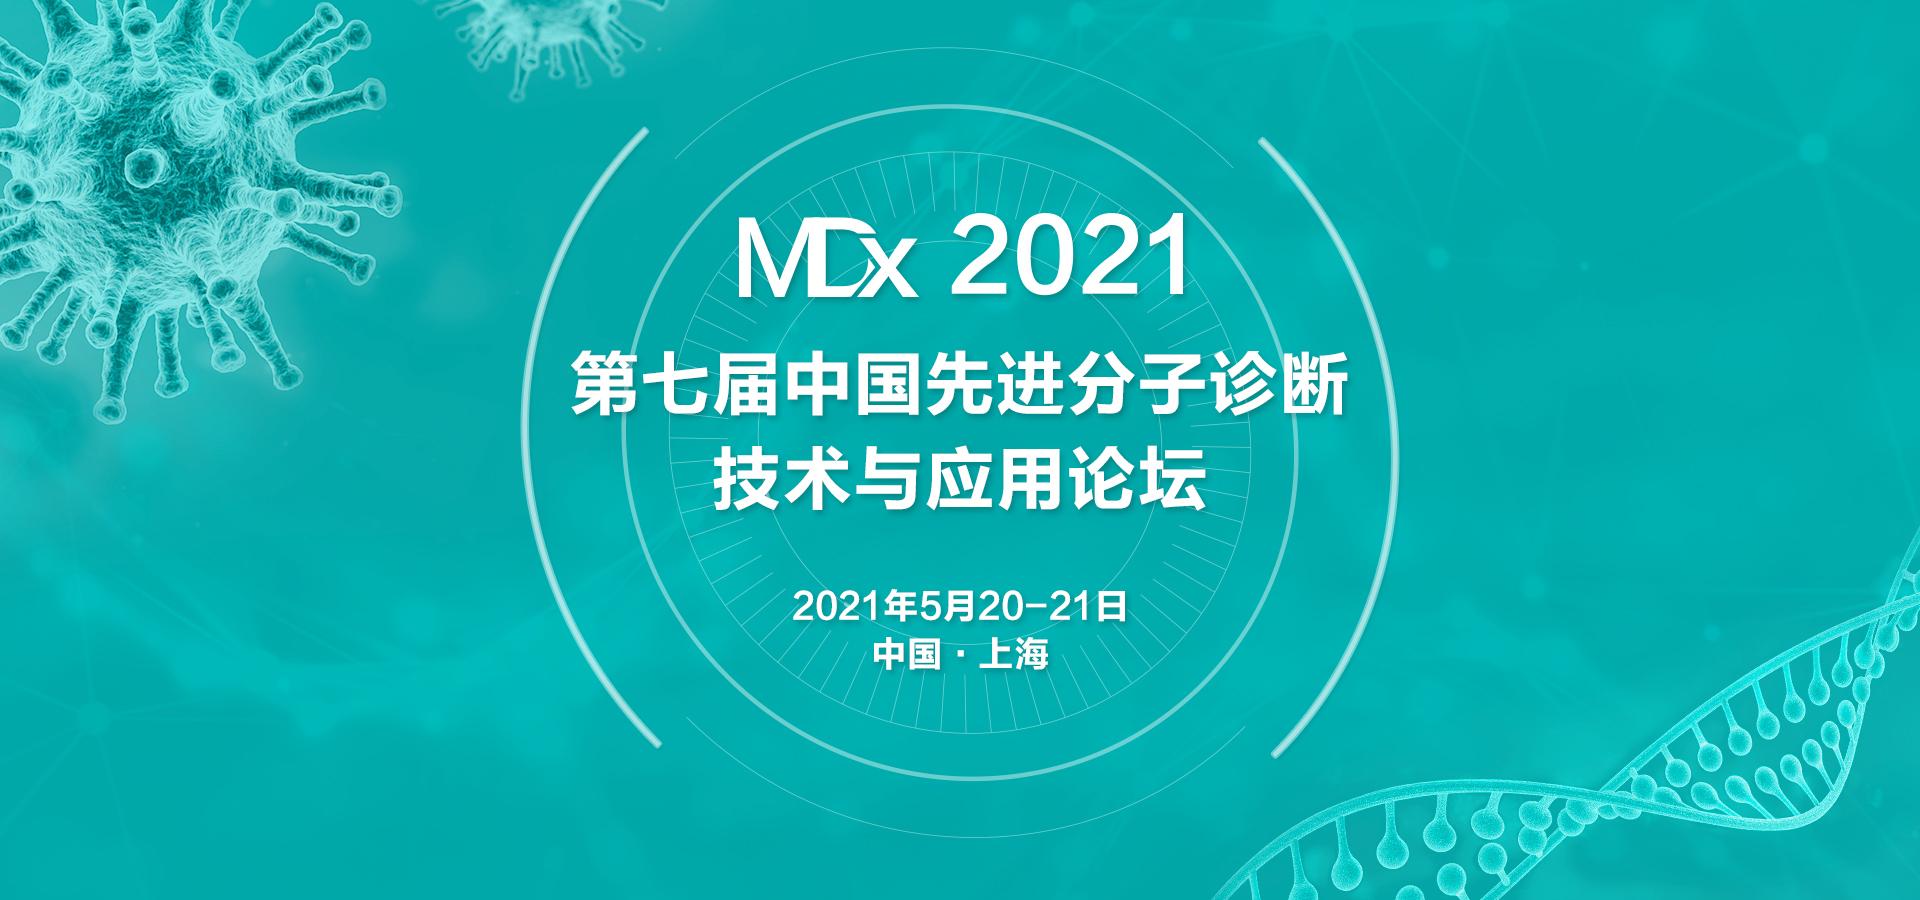 MDx第七届中国先进分子诊断技术与应用论坛